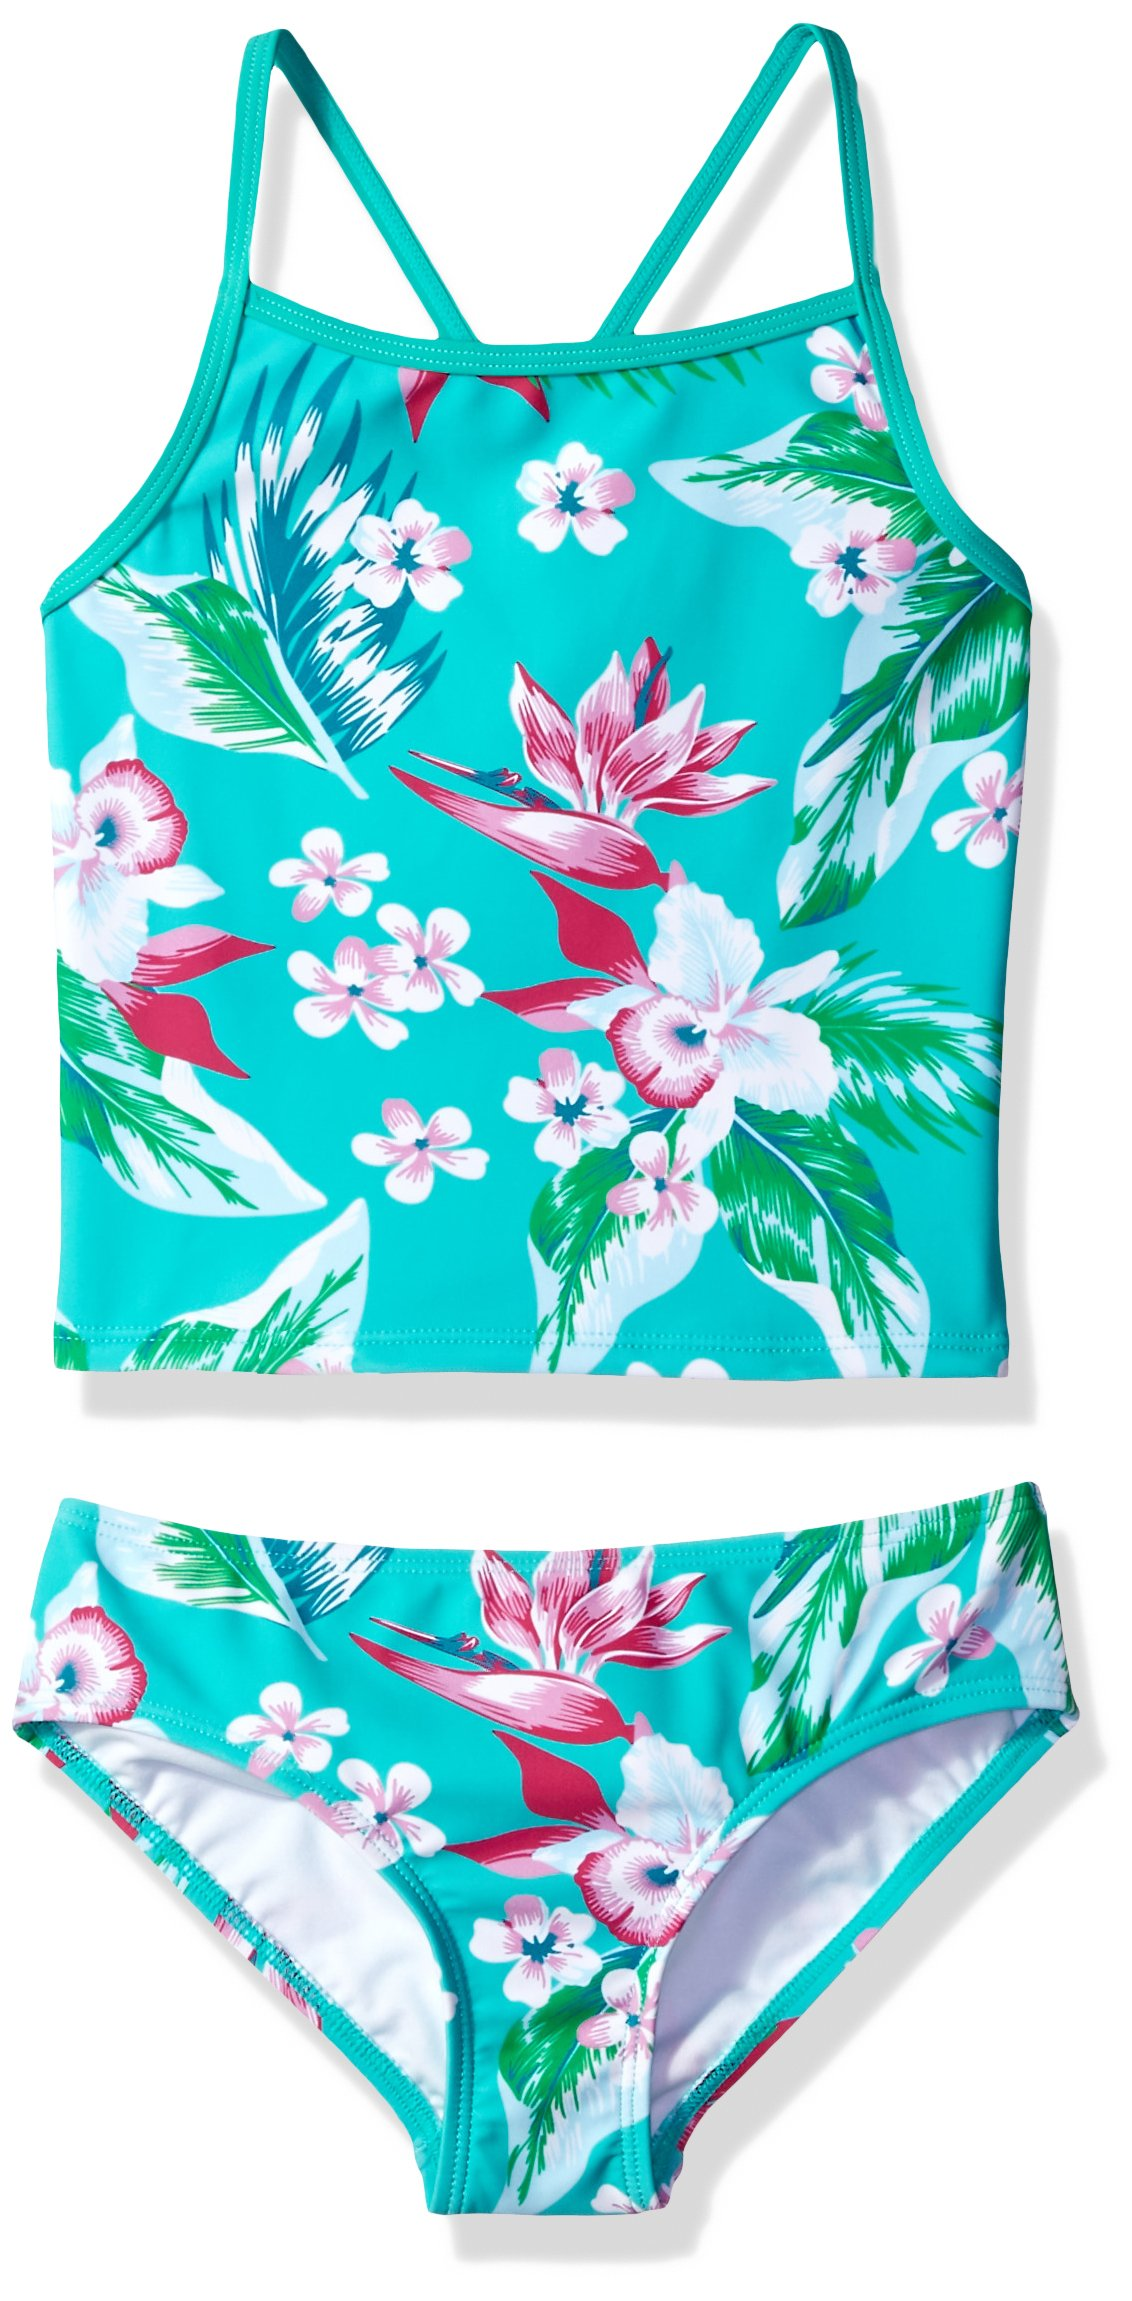 Kanu Surf Big Girls' Melanie Beach Sport 2-Piece Banded Tankini Swimsuit, Alania Floral Green, 12